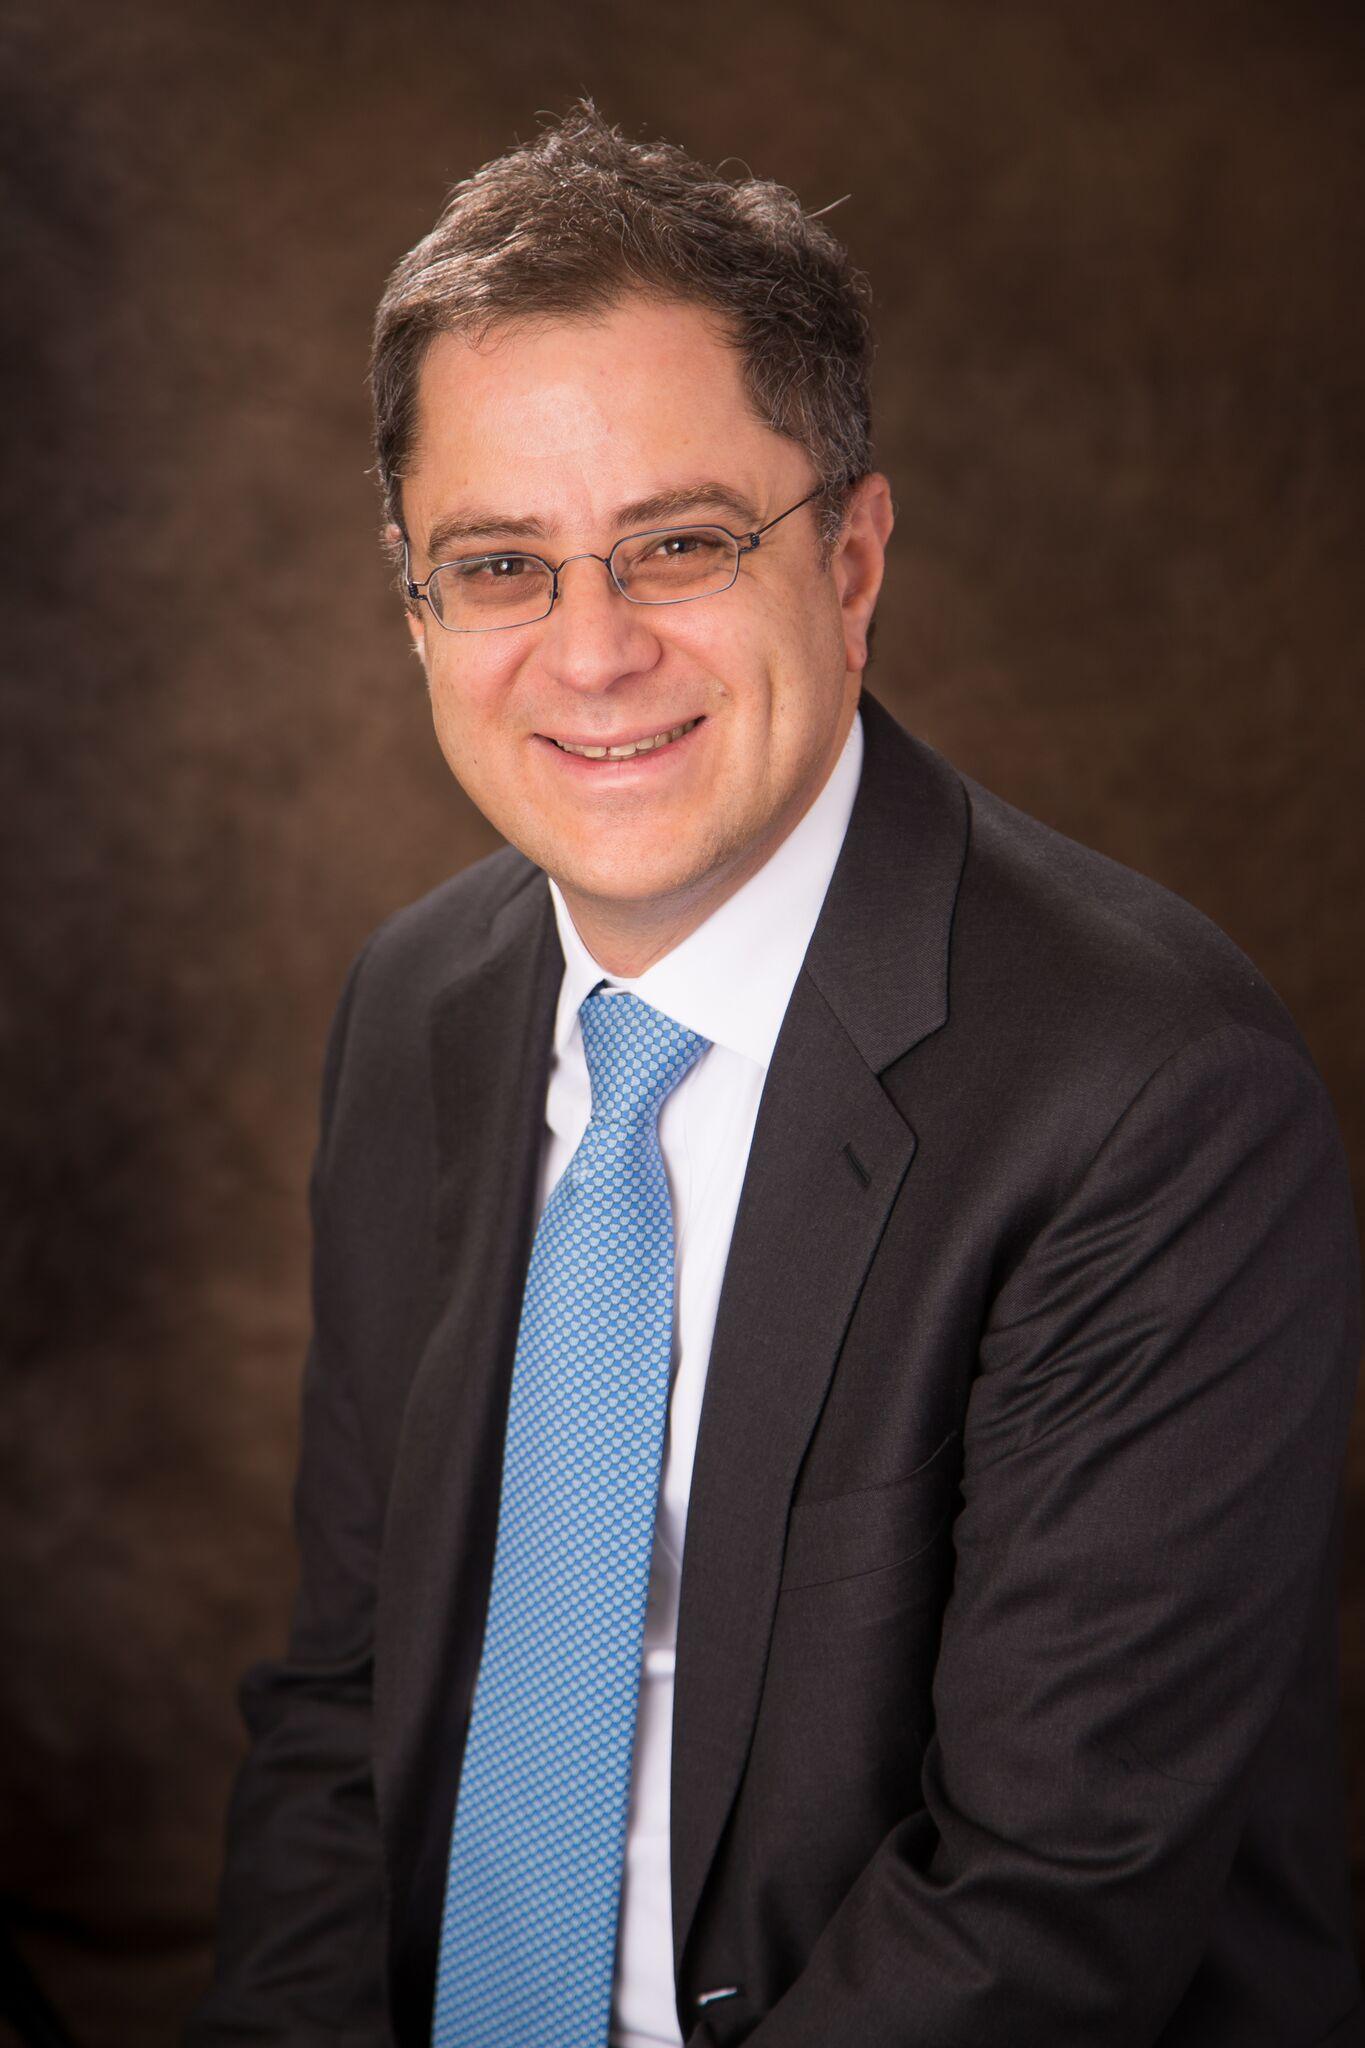 Chair, Ghassan K. Abou-Alfa, MD